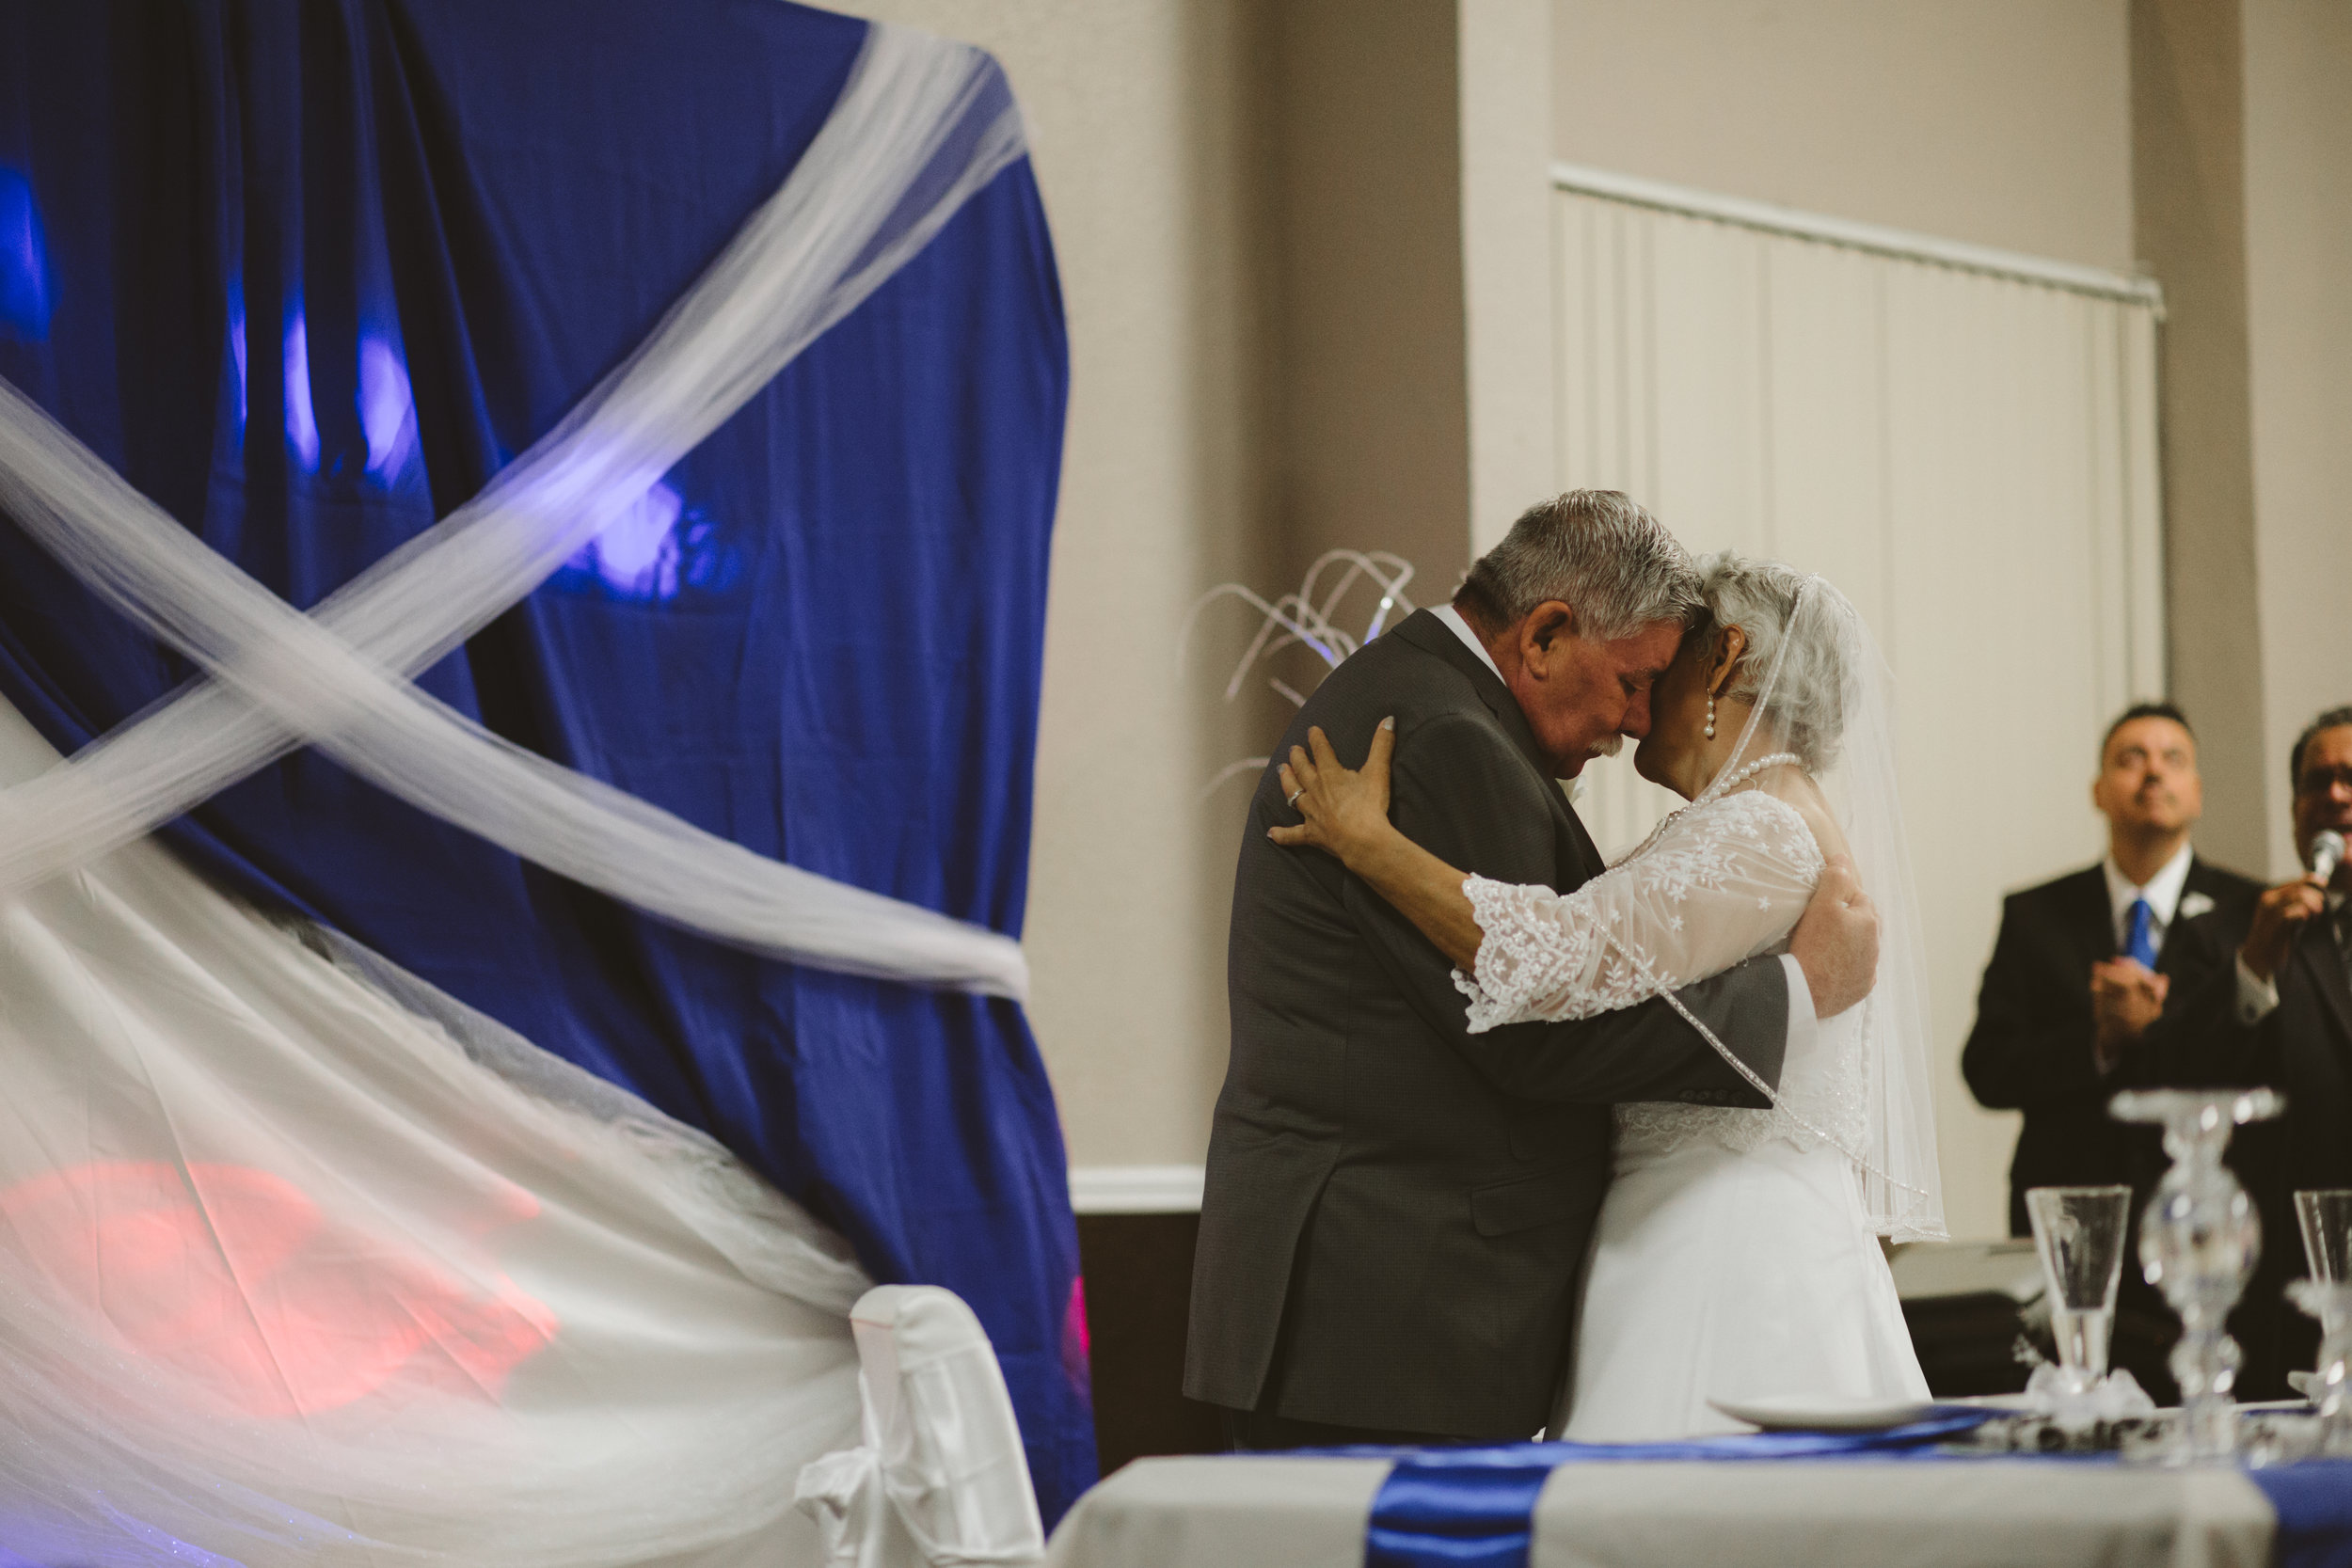 wedding | Vanessa Boy Photography | vanessaboy.com |-308.jpg